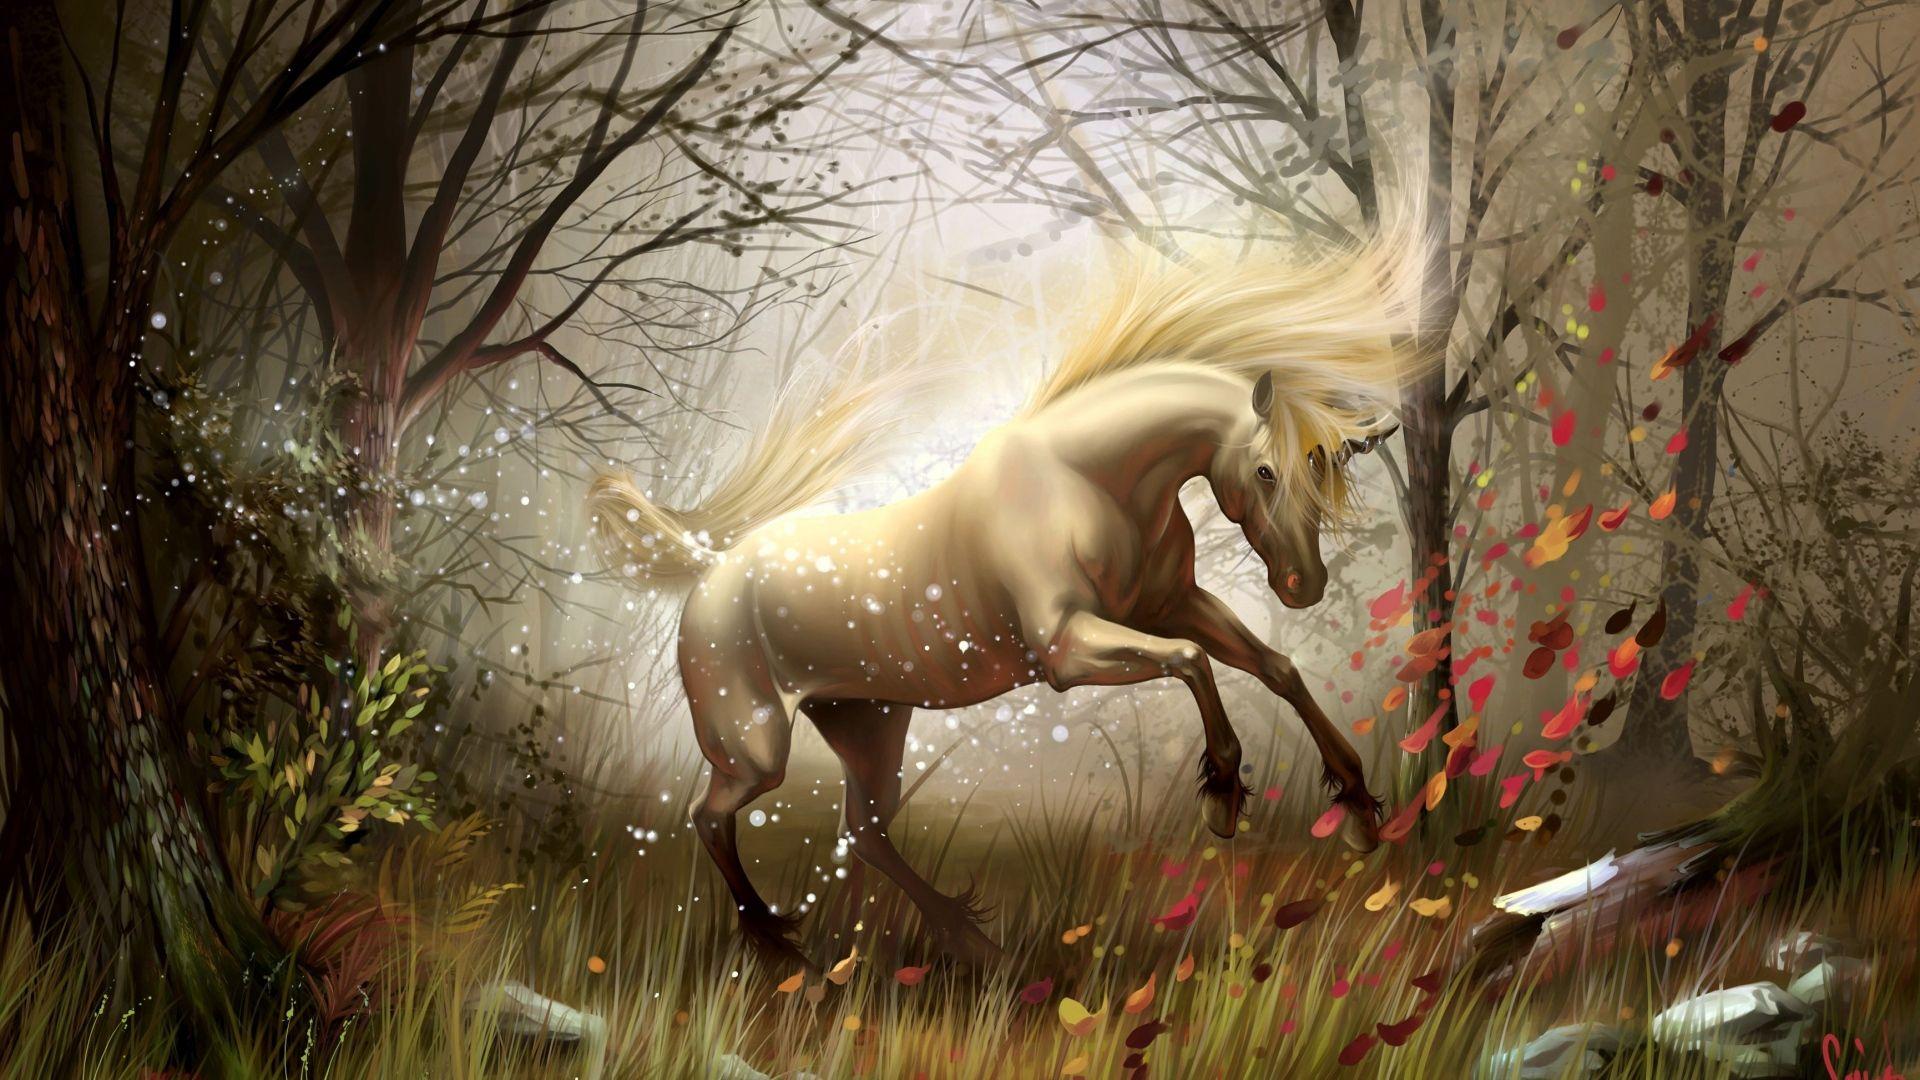 Simple Wallpaper Horse Steampunk - f0612cdd54f6d53c49fb742b2c6d3b19  Best Photo Reference_85653.jpg